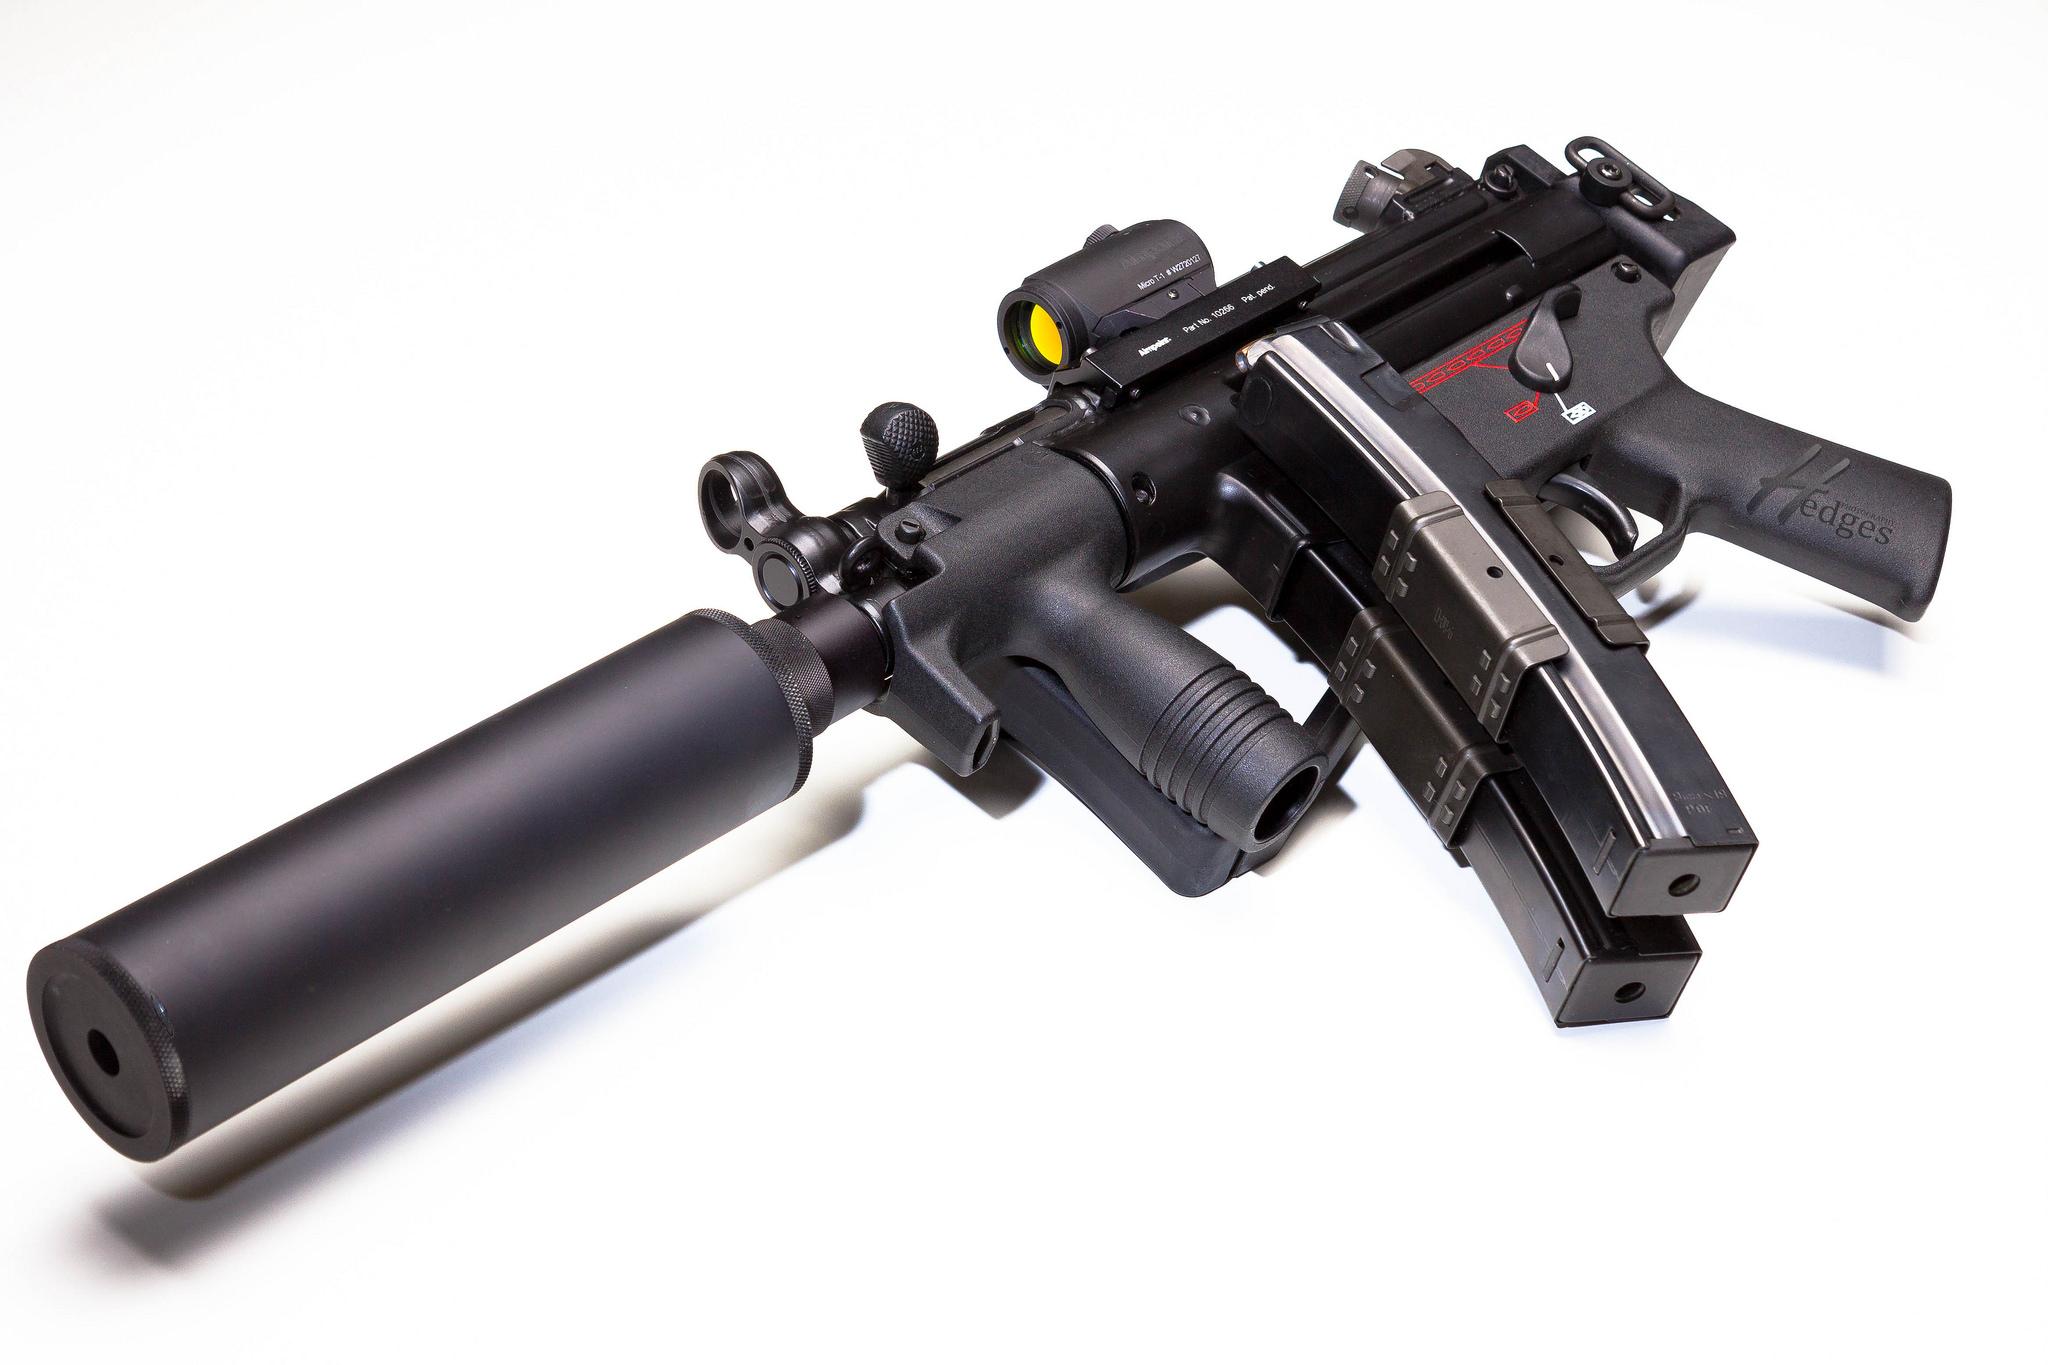 MP5k with Gemtech Mk9K-8480423331_8902cdfad6_k.jpg